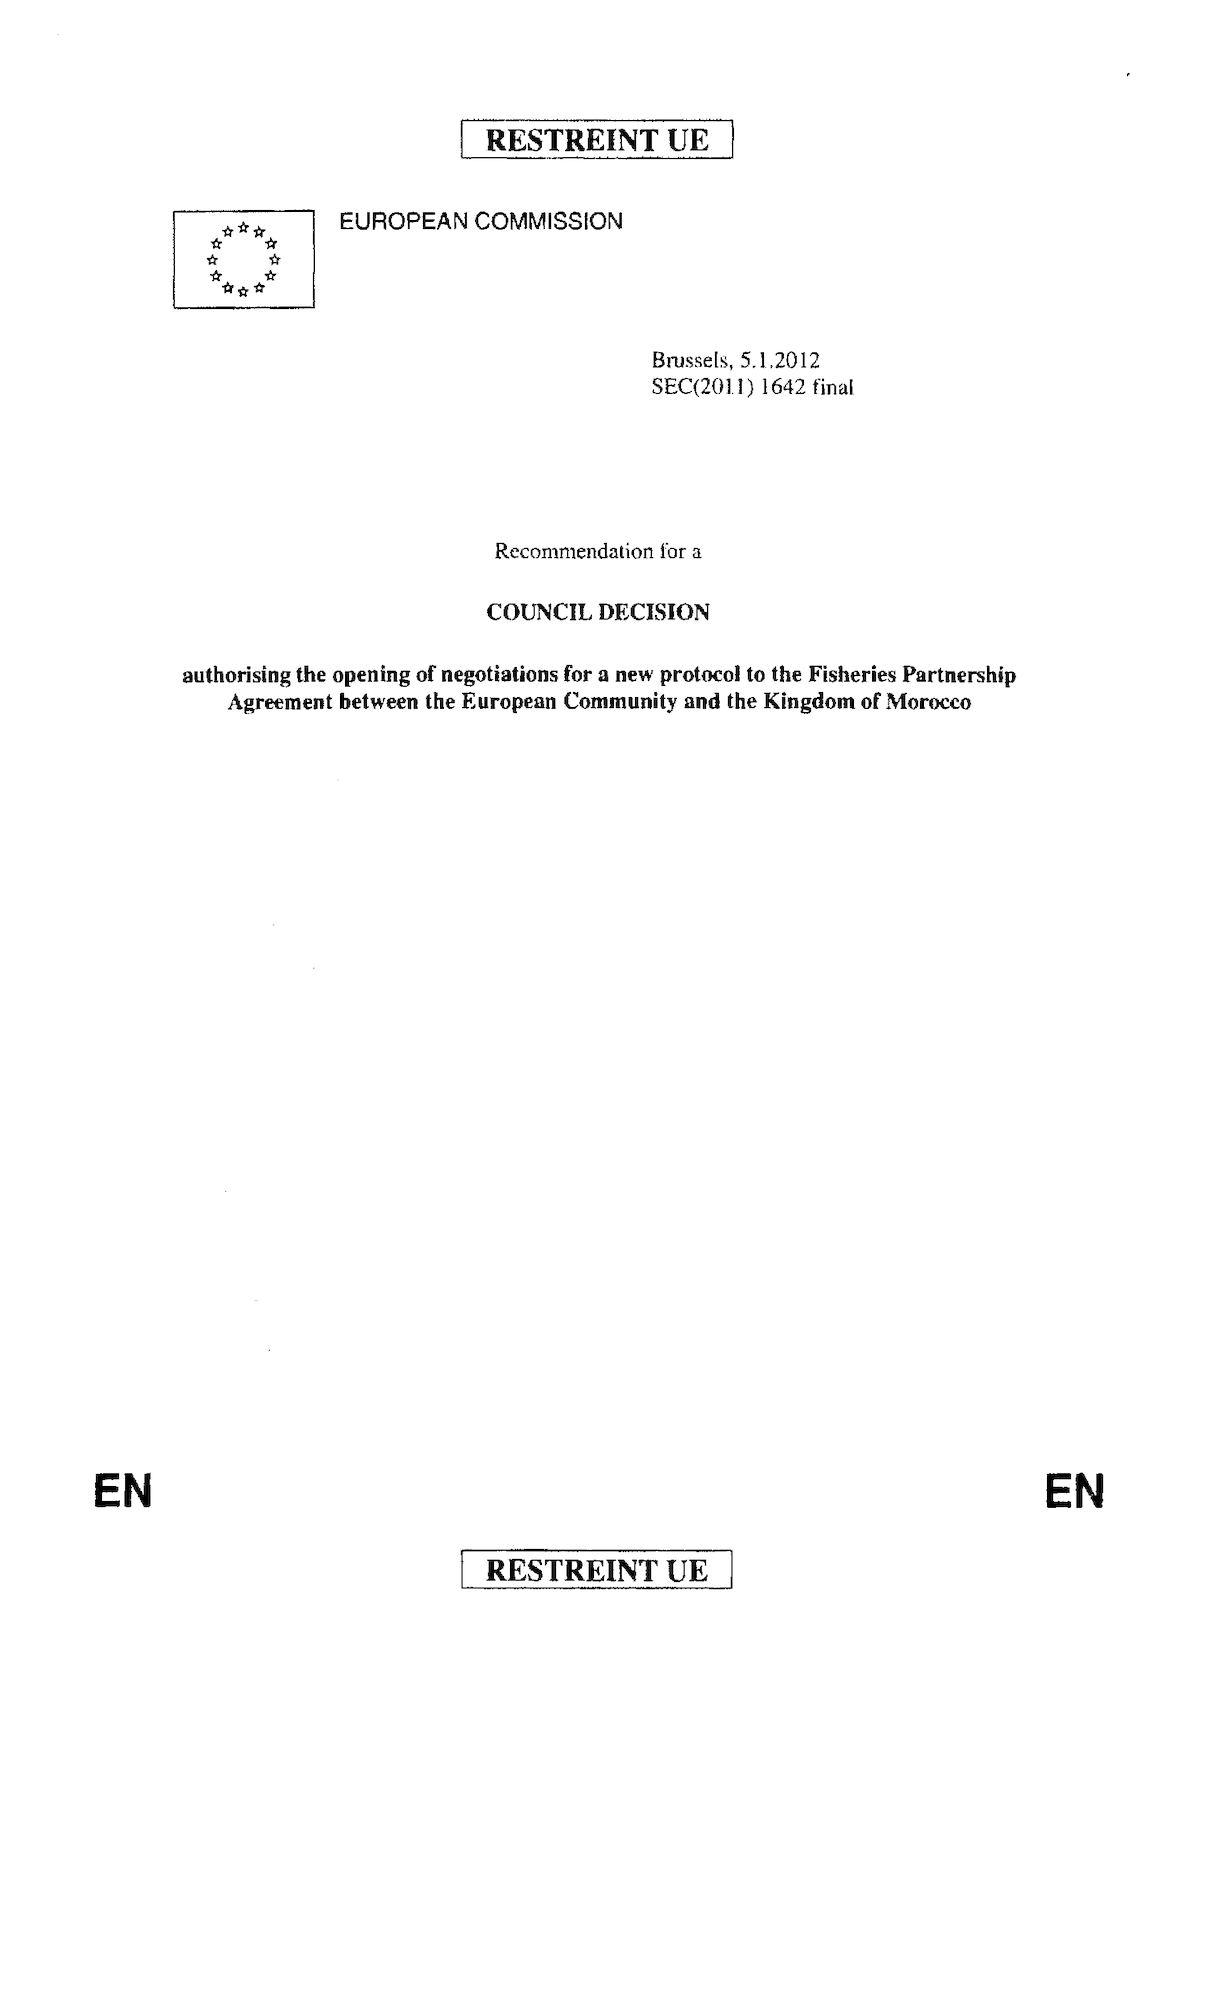 Projet Directive Négociation Protocole 5 Janvier 2012